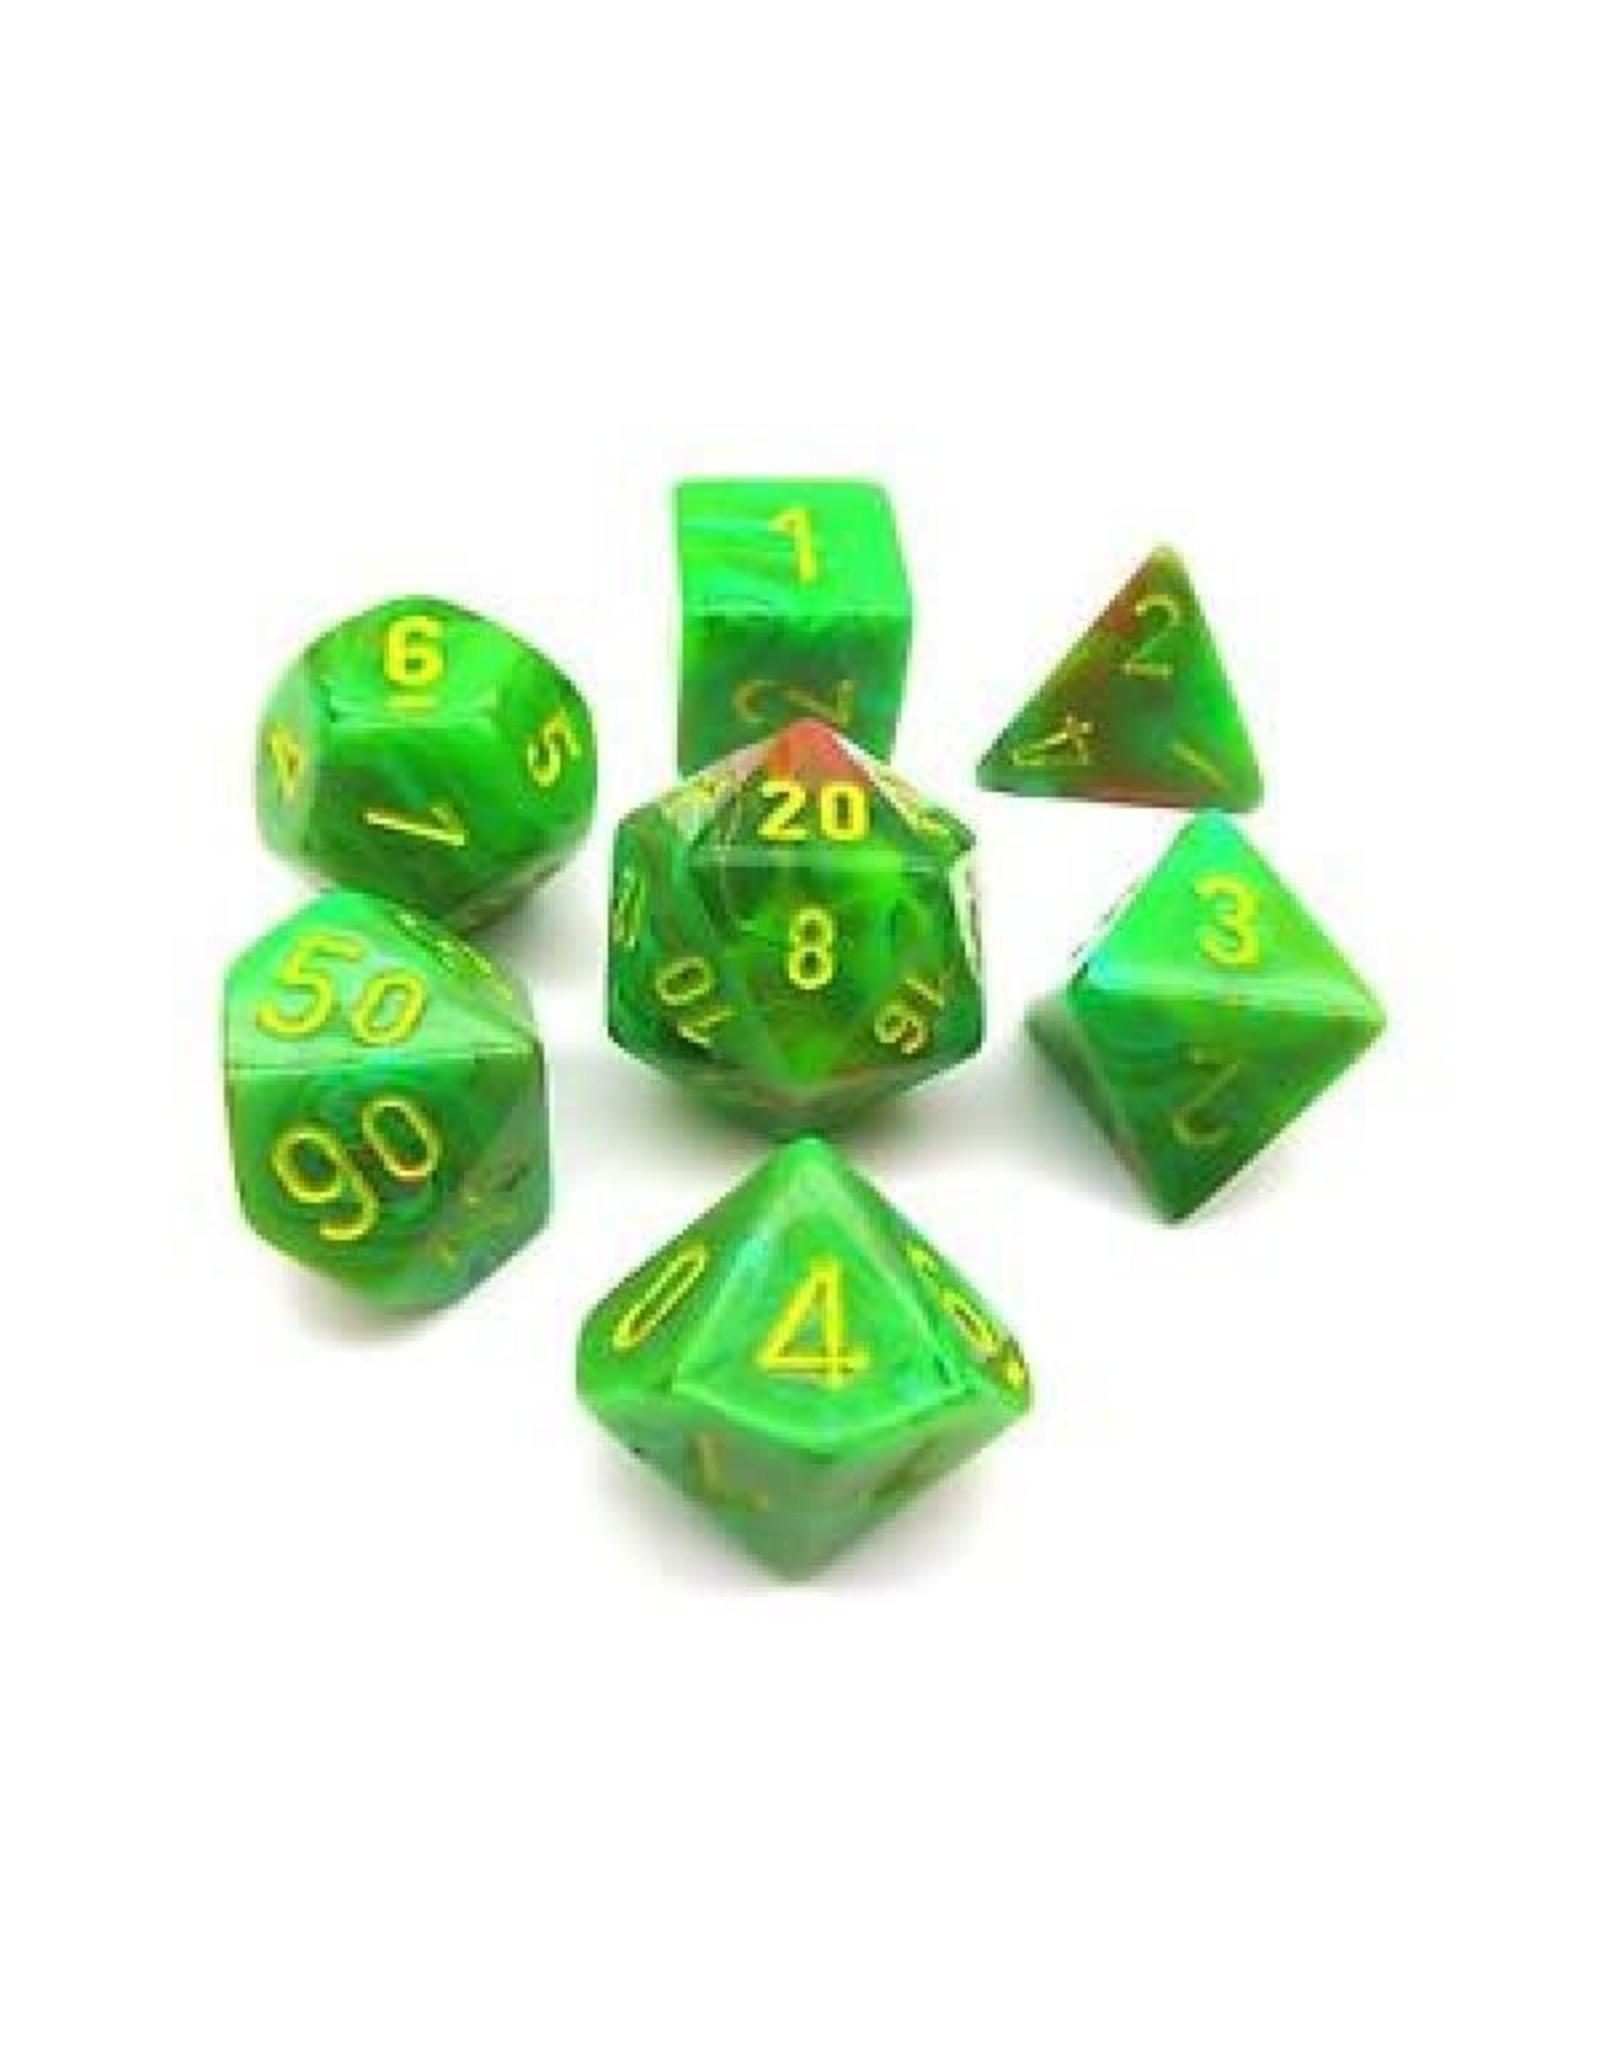 Chessex 7PC RPG DICE VORTEX SLIME/YELLOW